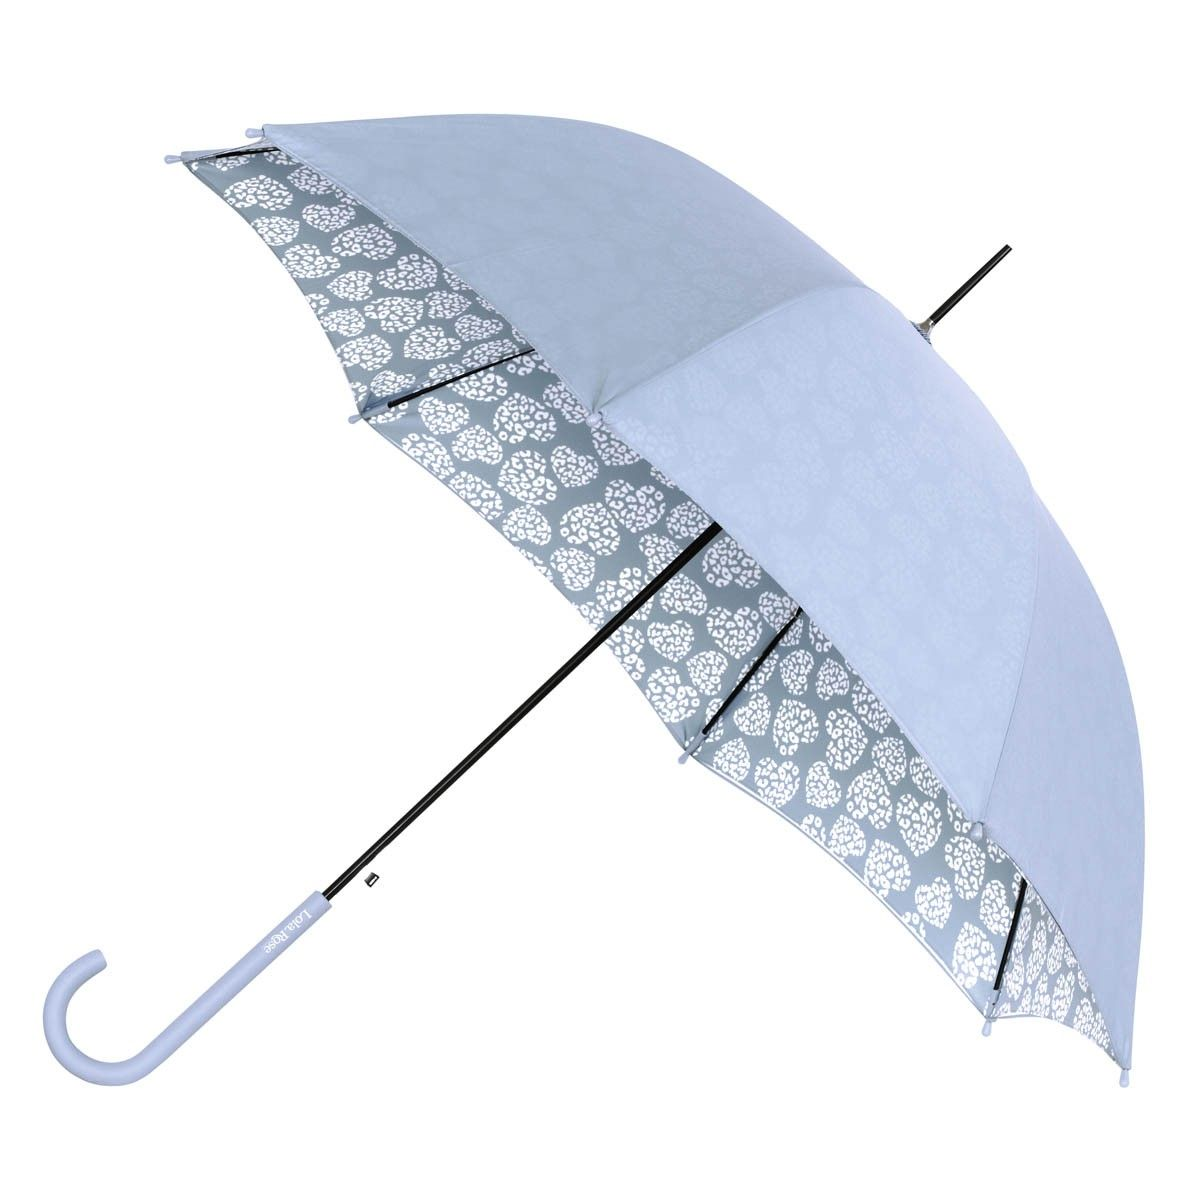 Lola Rose Leopard Heart Print Walker Umbrella In Dusky Blue Umbrella Blue Umbrella Under My Umbrella